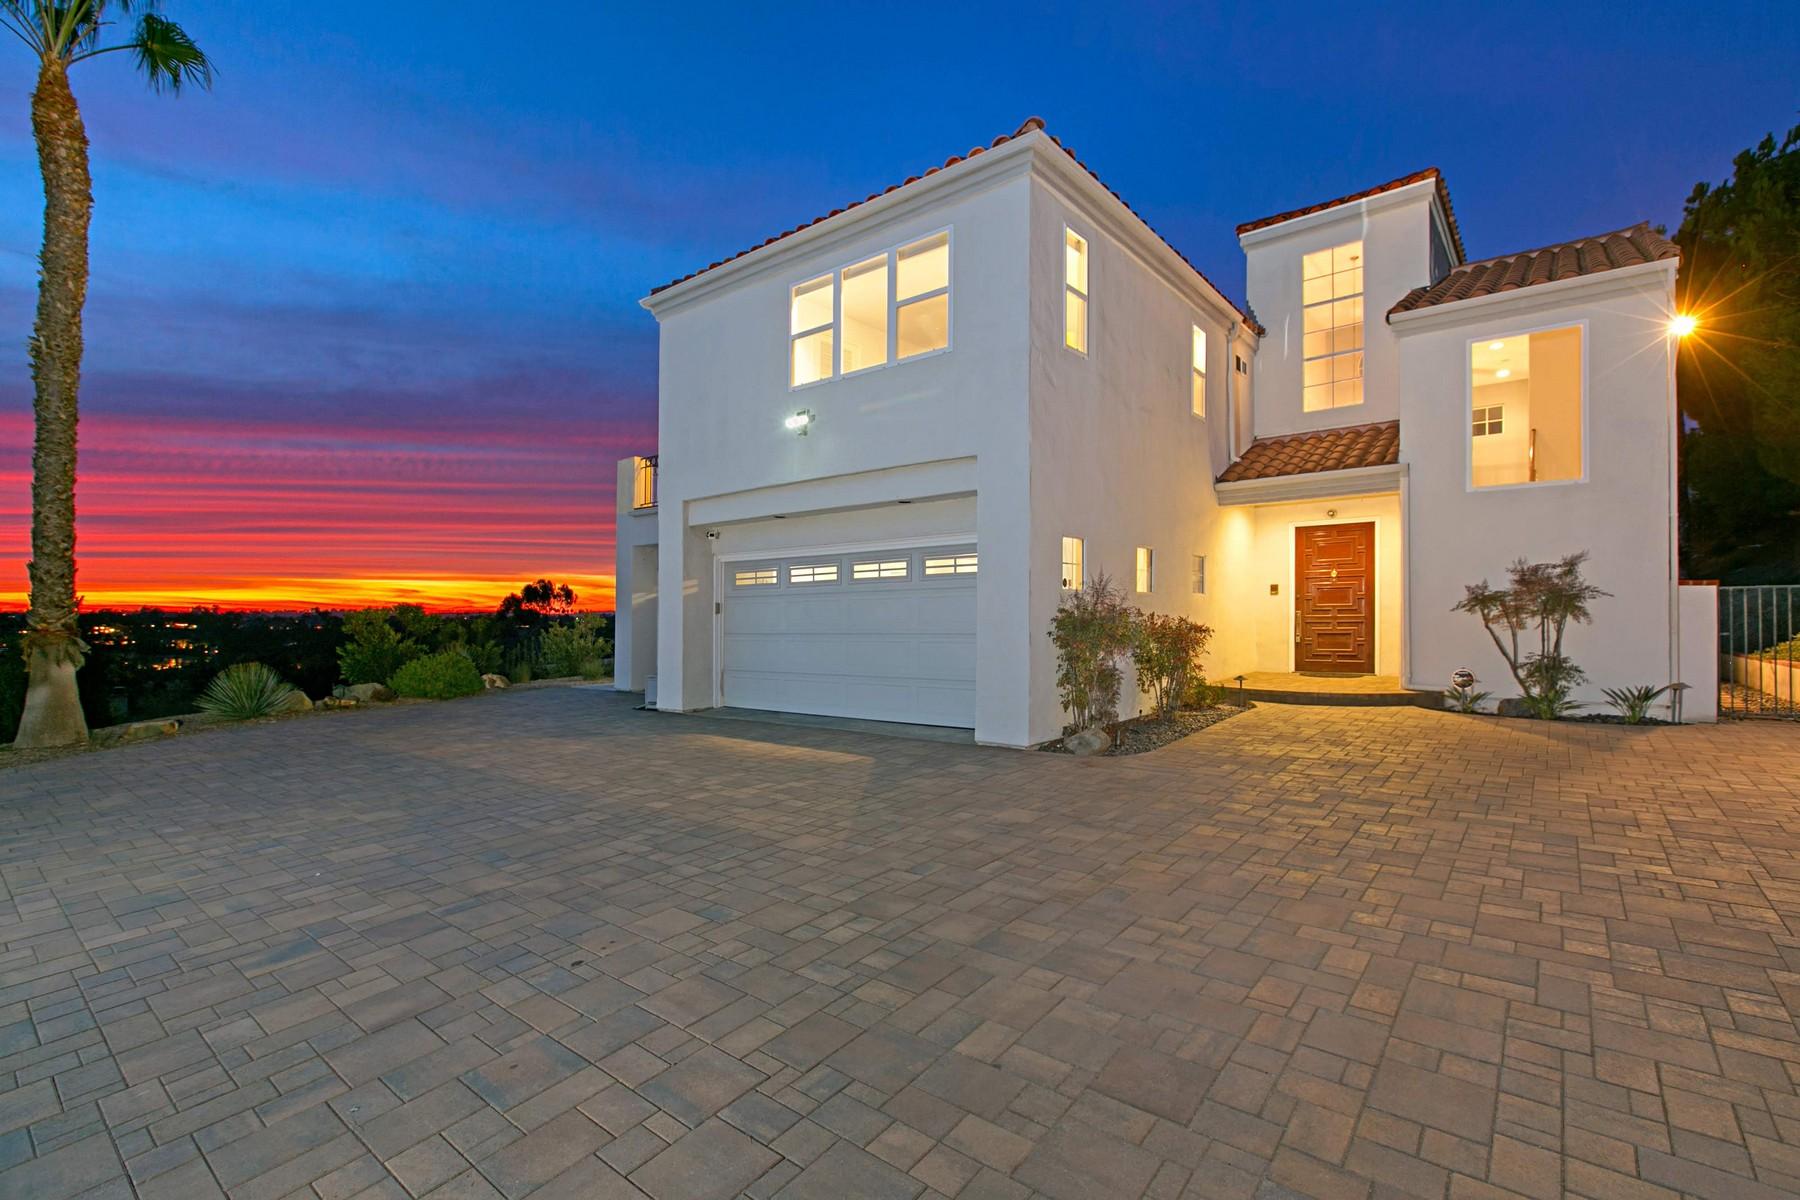 Single Family Homes for Sale at 1240 Rancho Encinitas Drive Encinitas, California 92024 United States